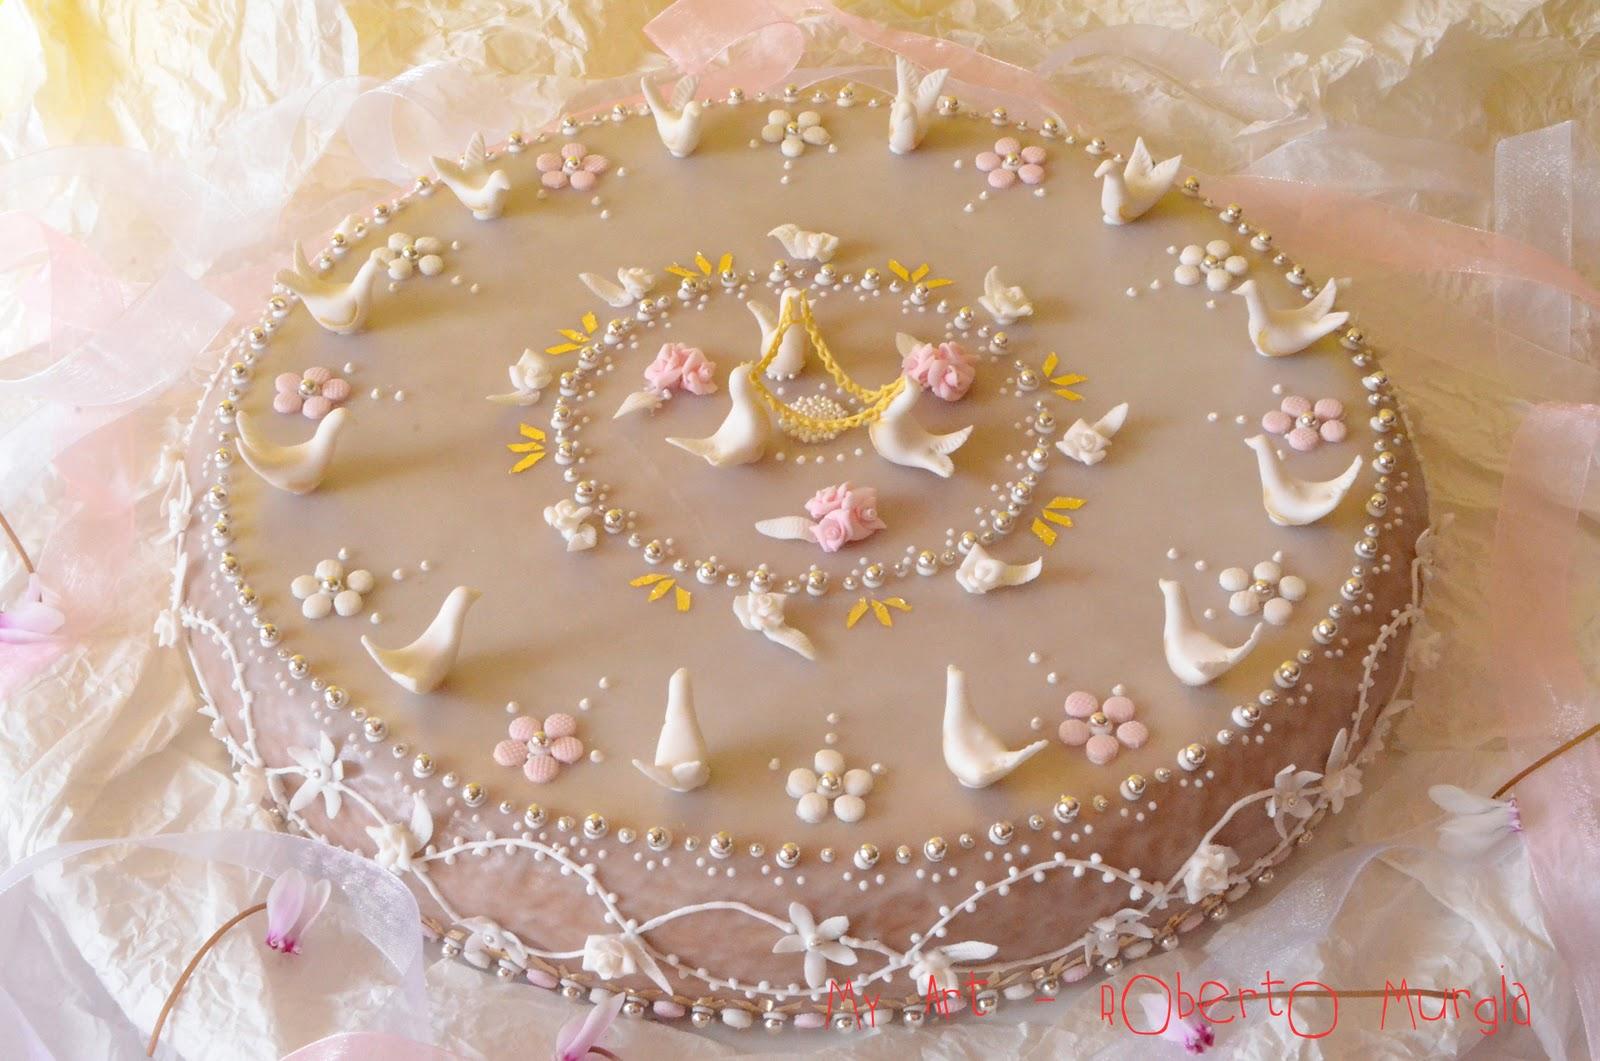 My art roberto murgia truta a mazz 39 e mendula torta di for Ricette dolci sardi